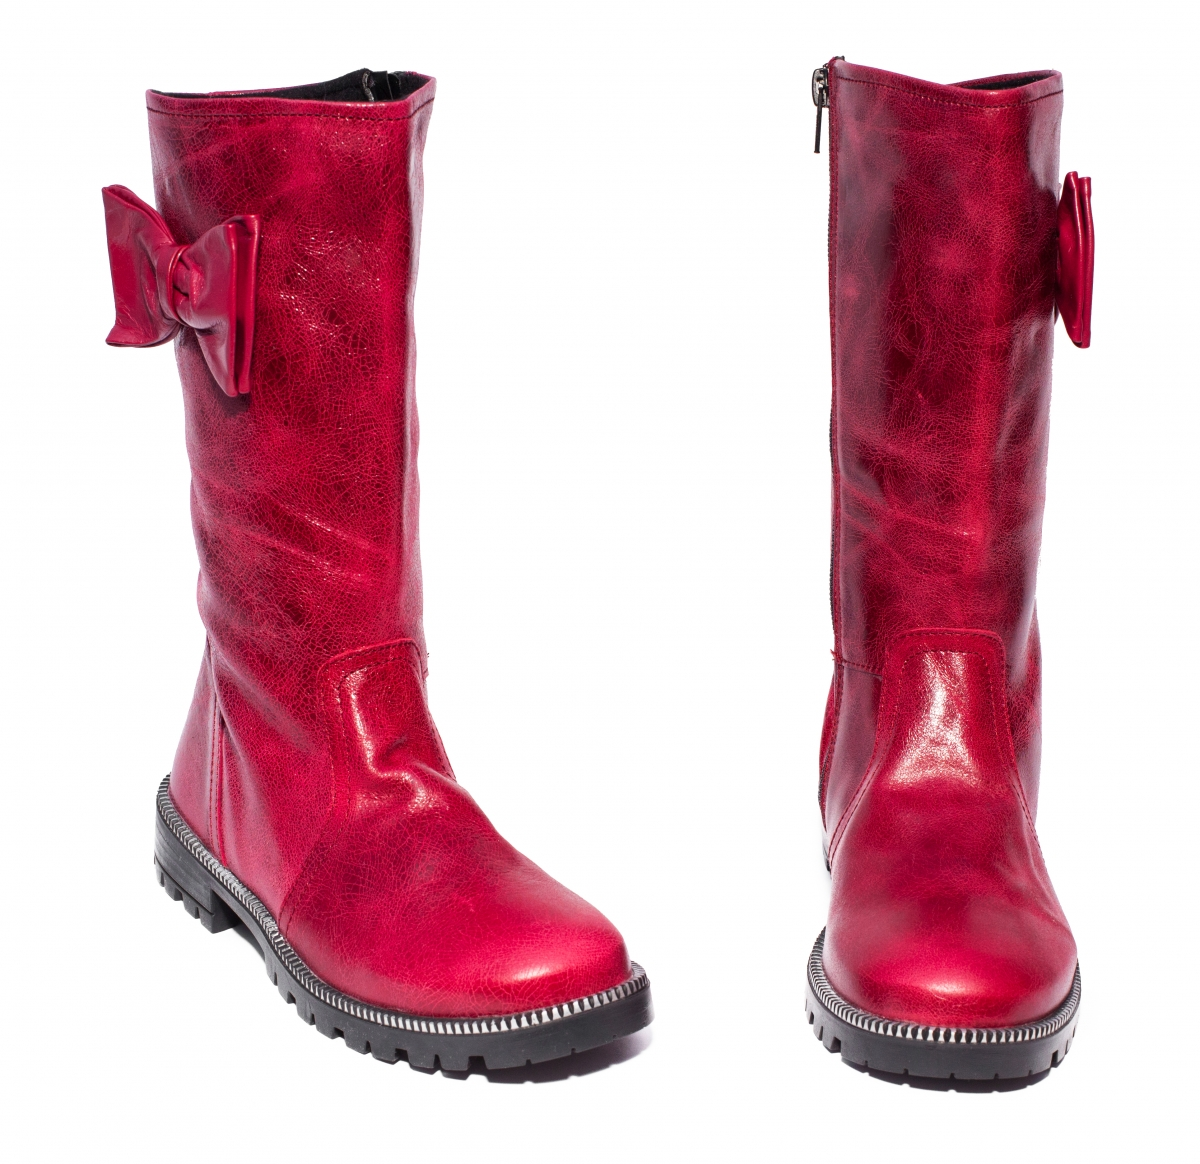 Cizme fete piele pj shoes Ada bordo 27-36